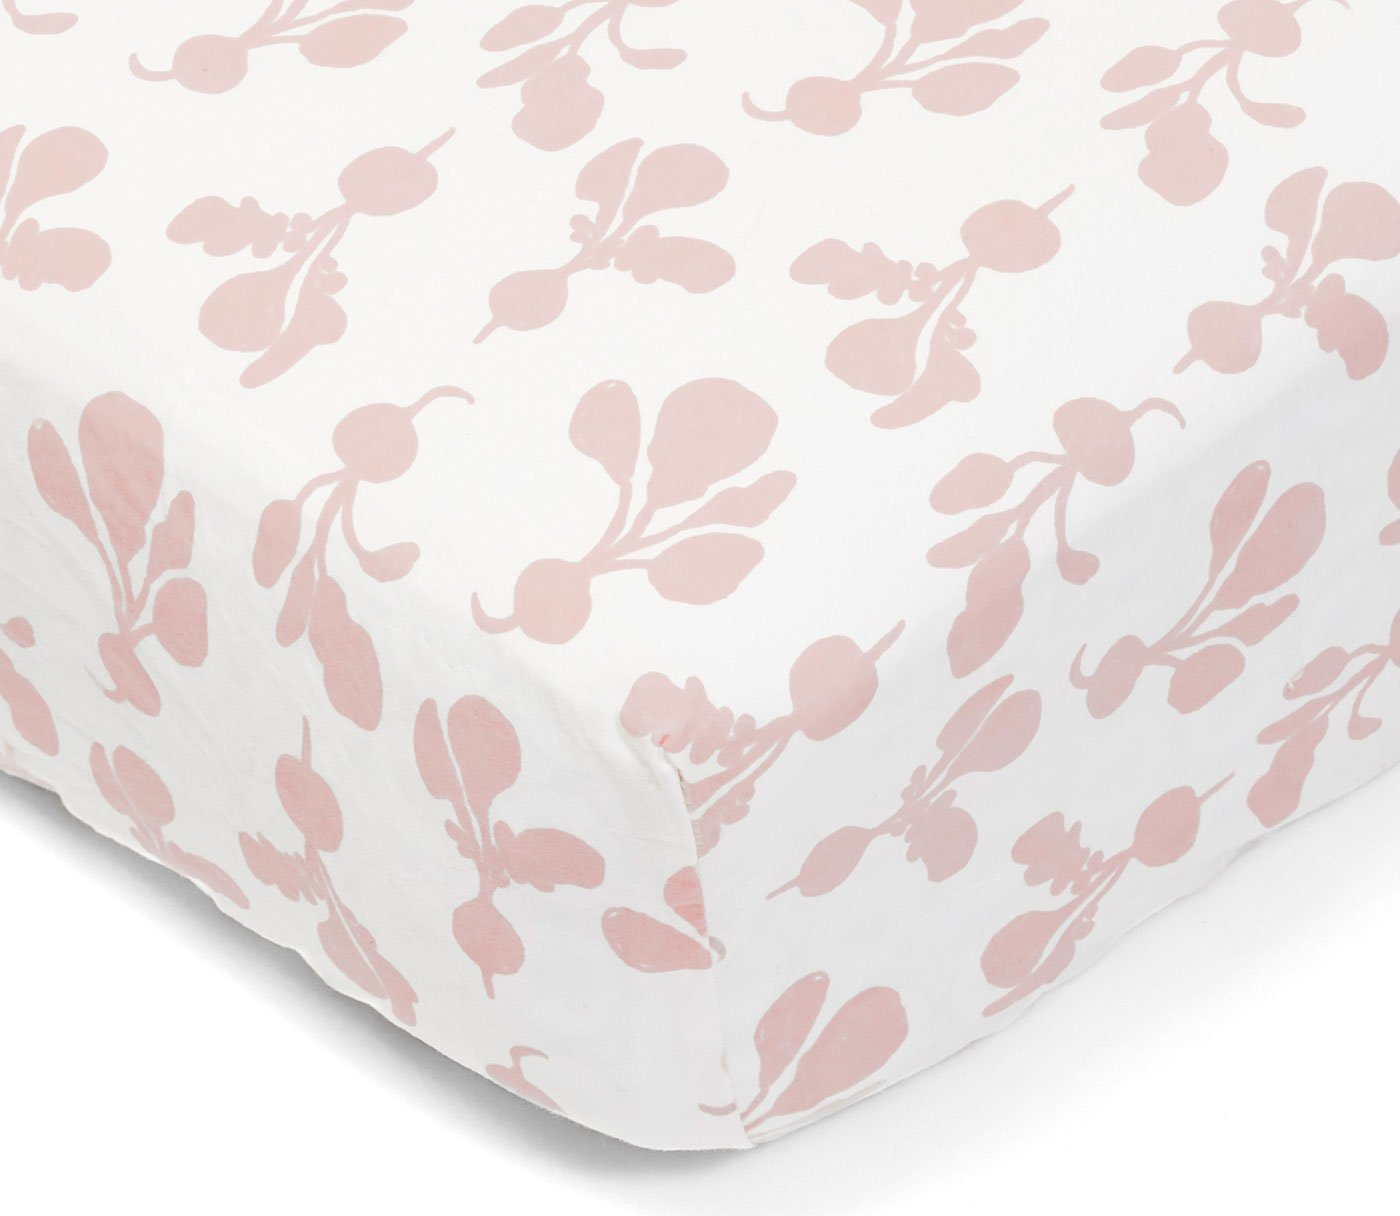 Lewis Organic Cotton Fitted Crib Sheet Radish Print 100% Organic Cotton Percale, Blush